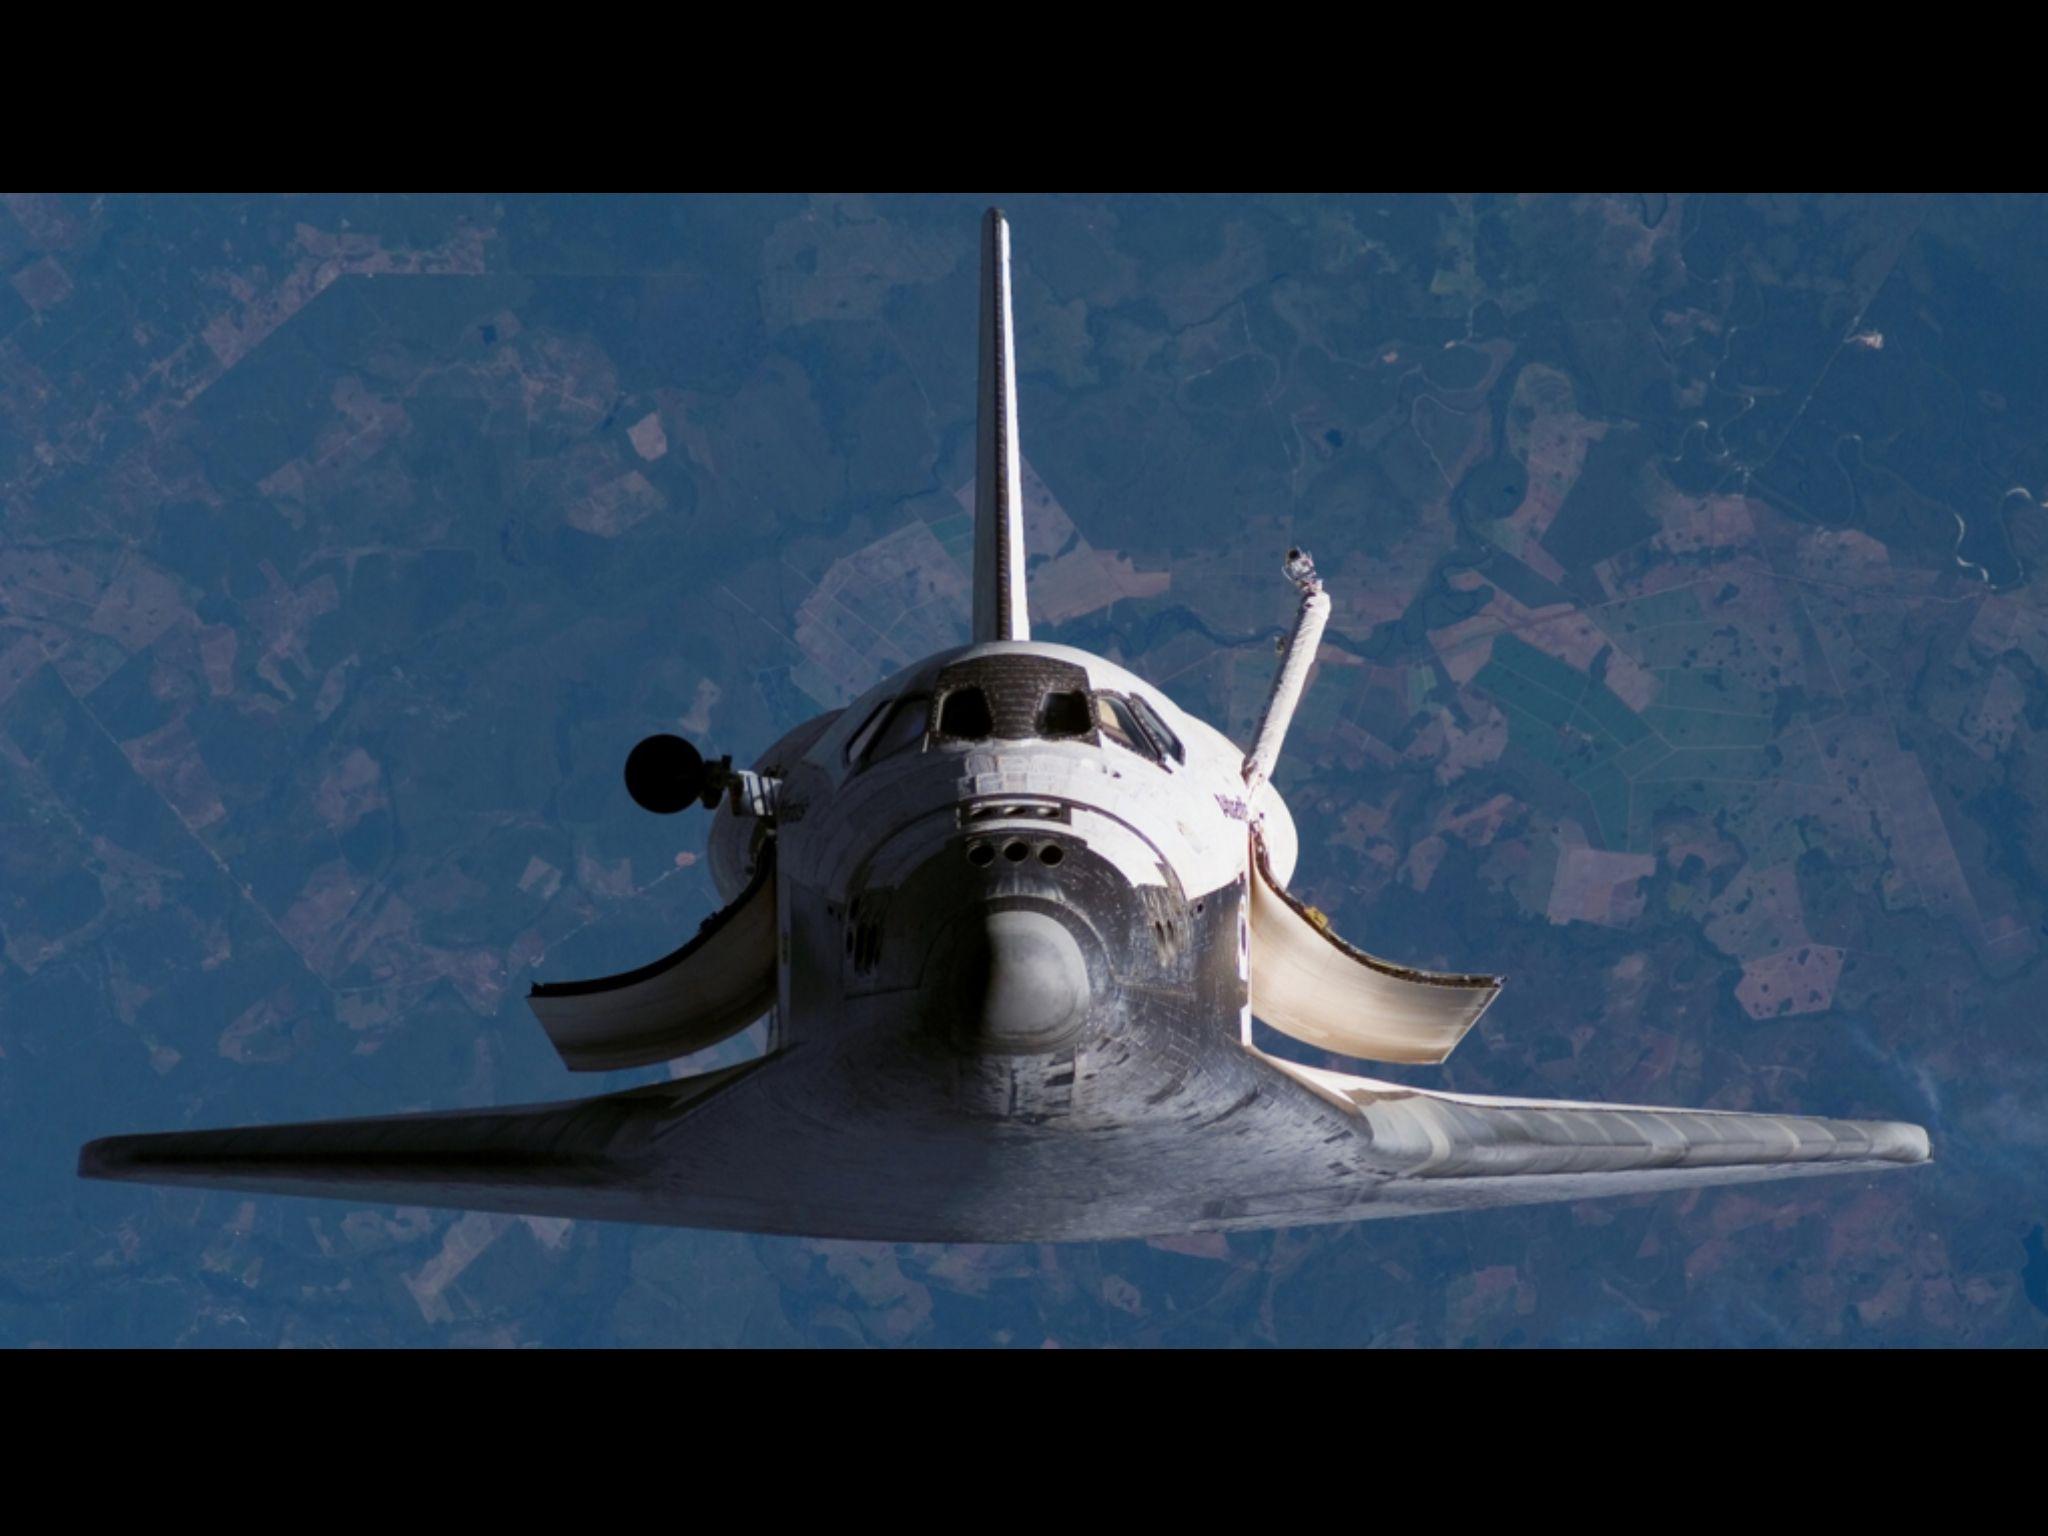 Doors open. Space shuttle, Space flight, Nasa space shuttle